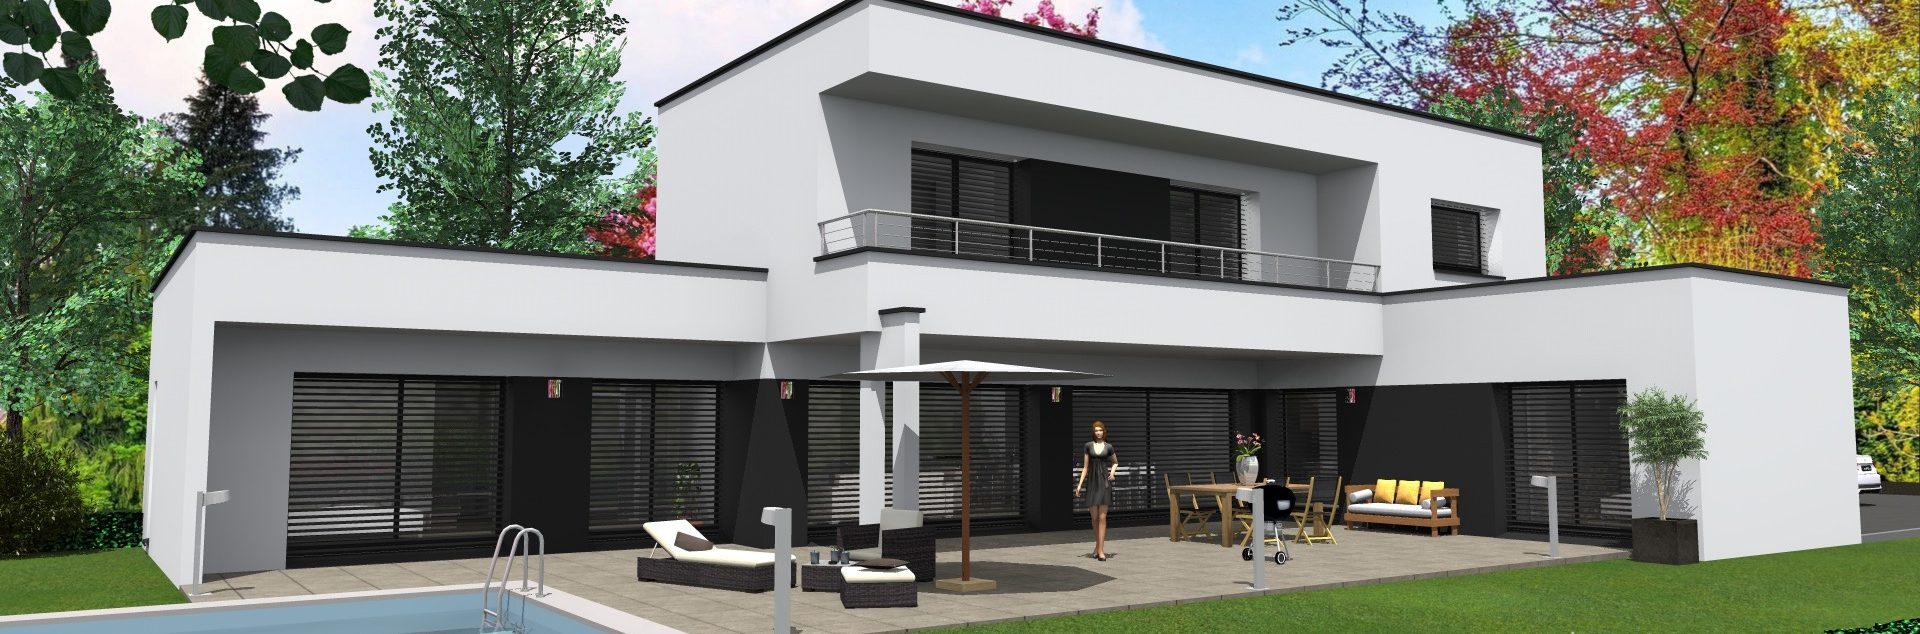 227 m²